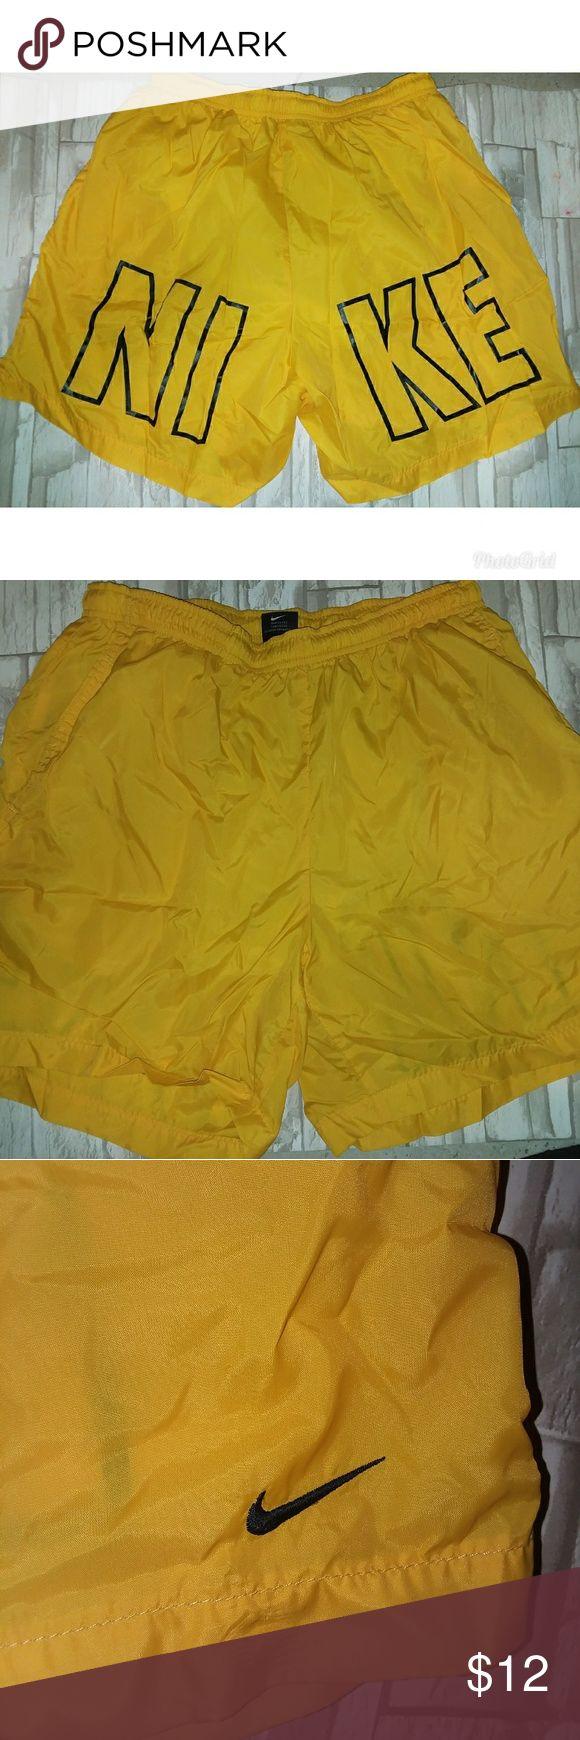 {Nike} yellow swim shorts Men's Nike swim shorts Yellow Nike on back and Nike symbol on front  Size large   Excellent condition Nike Swim Swim Trunks